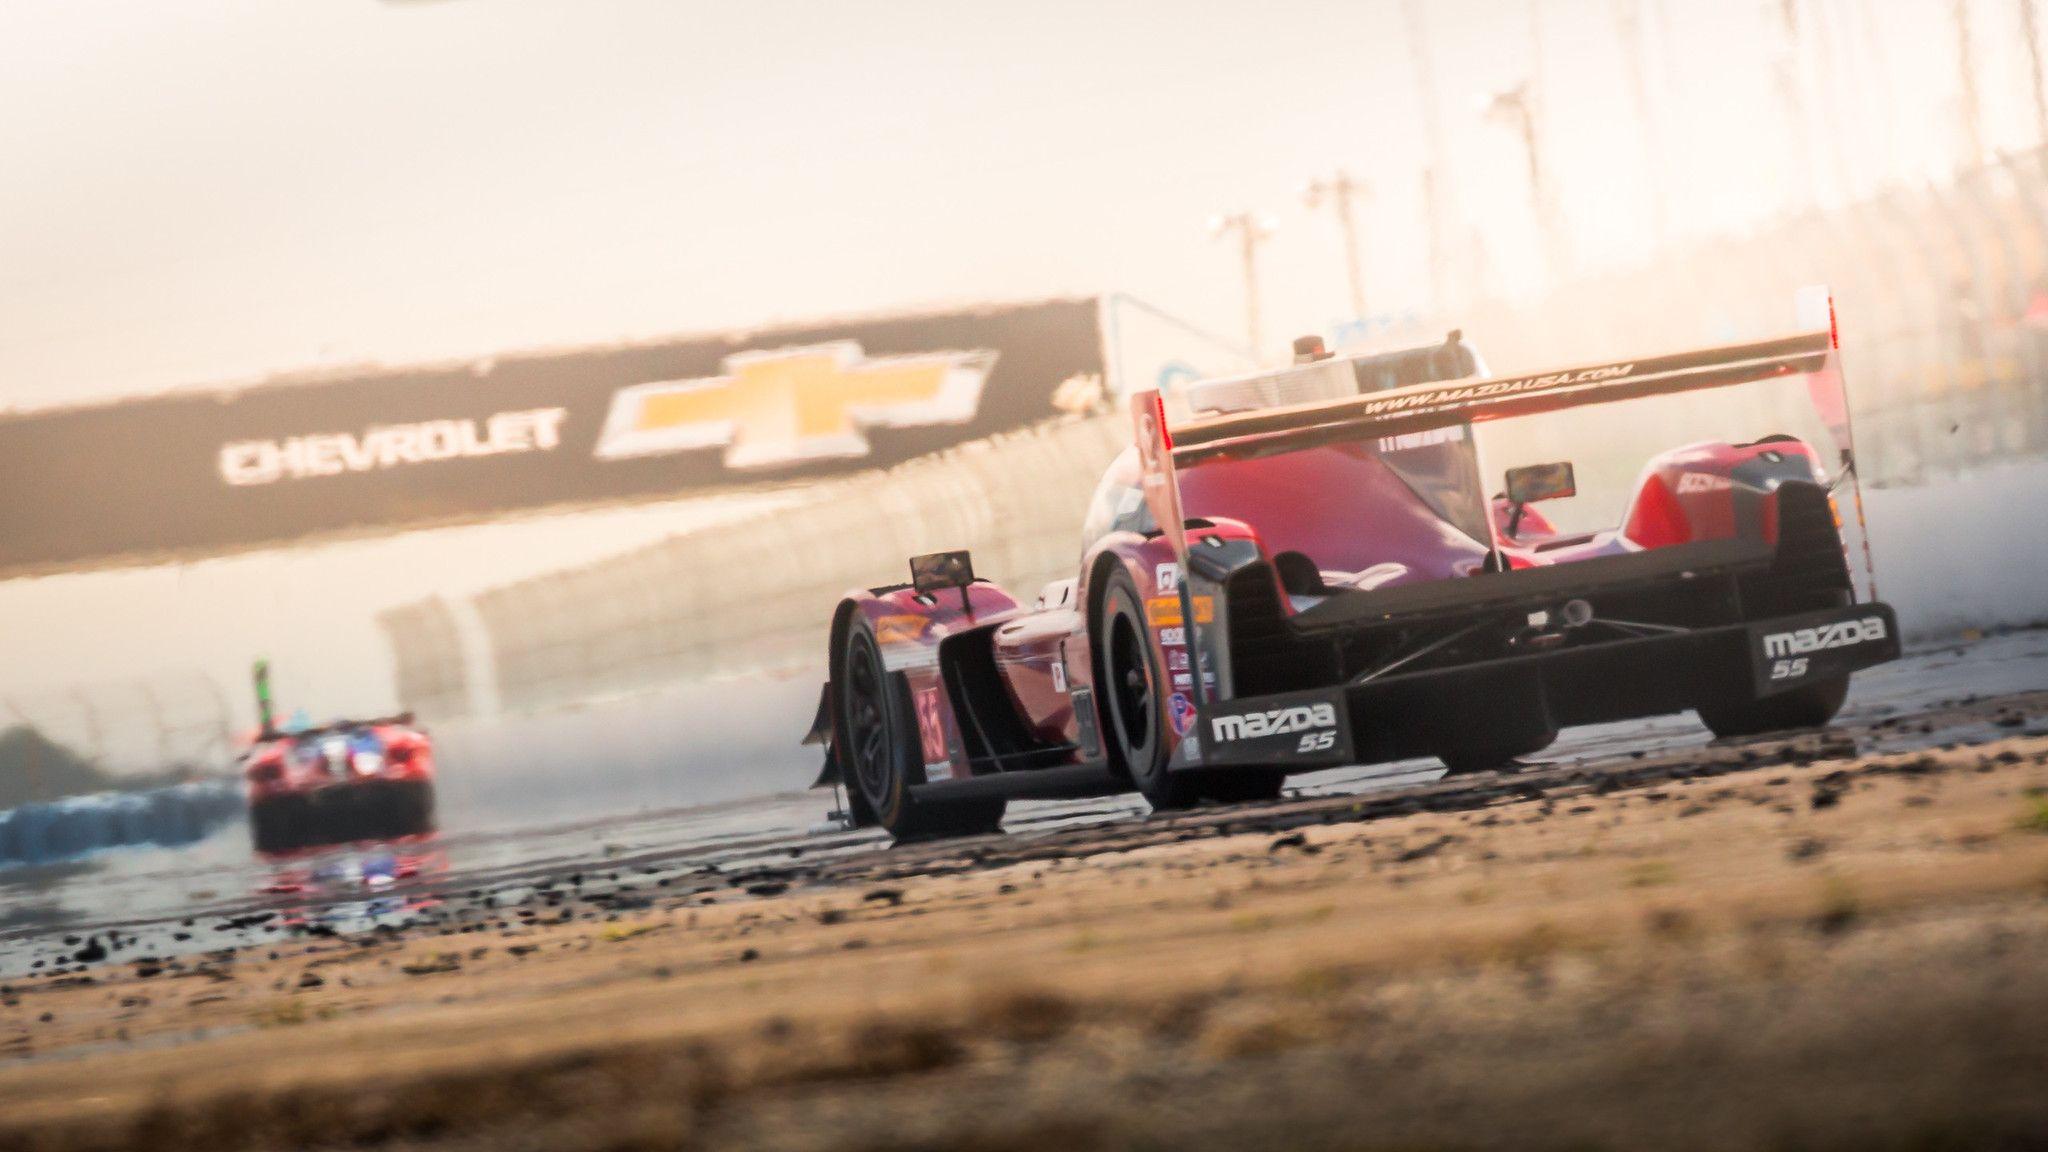 Mazda DPi (With images) Race photography, Mazda, Racing